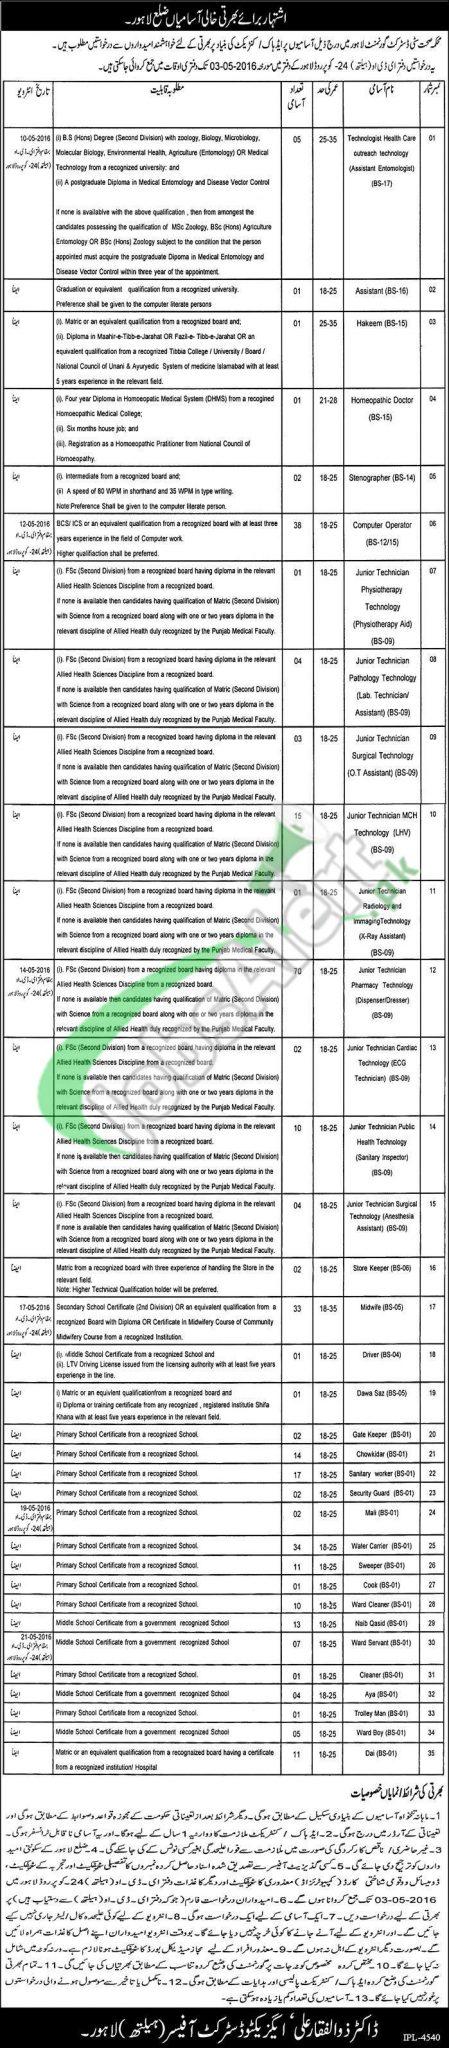 Health Dapartment Lahore Jobs